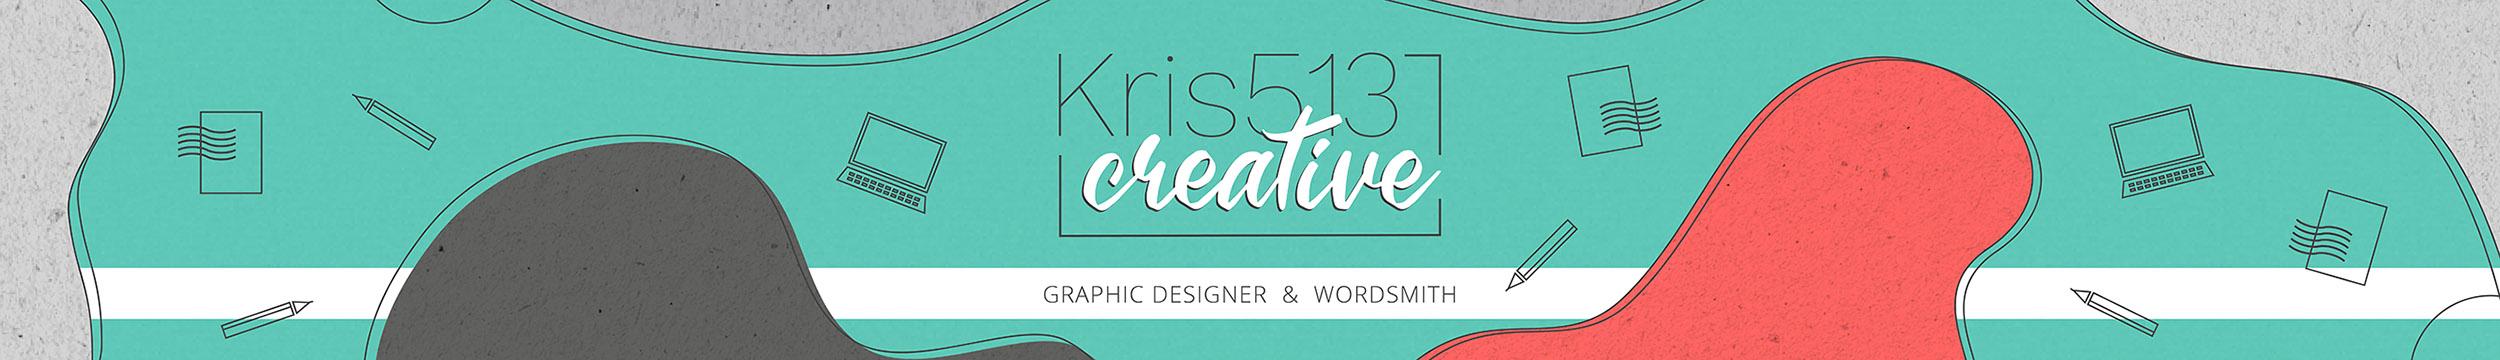 Kris513creative